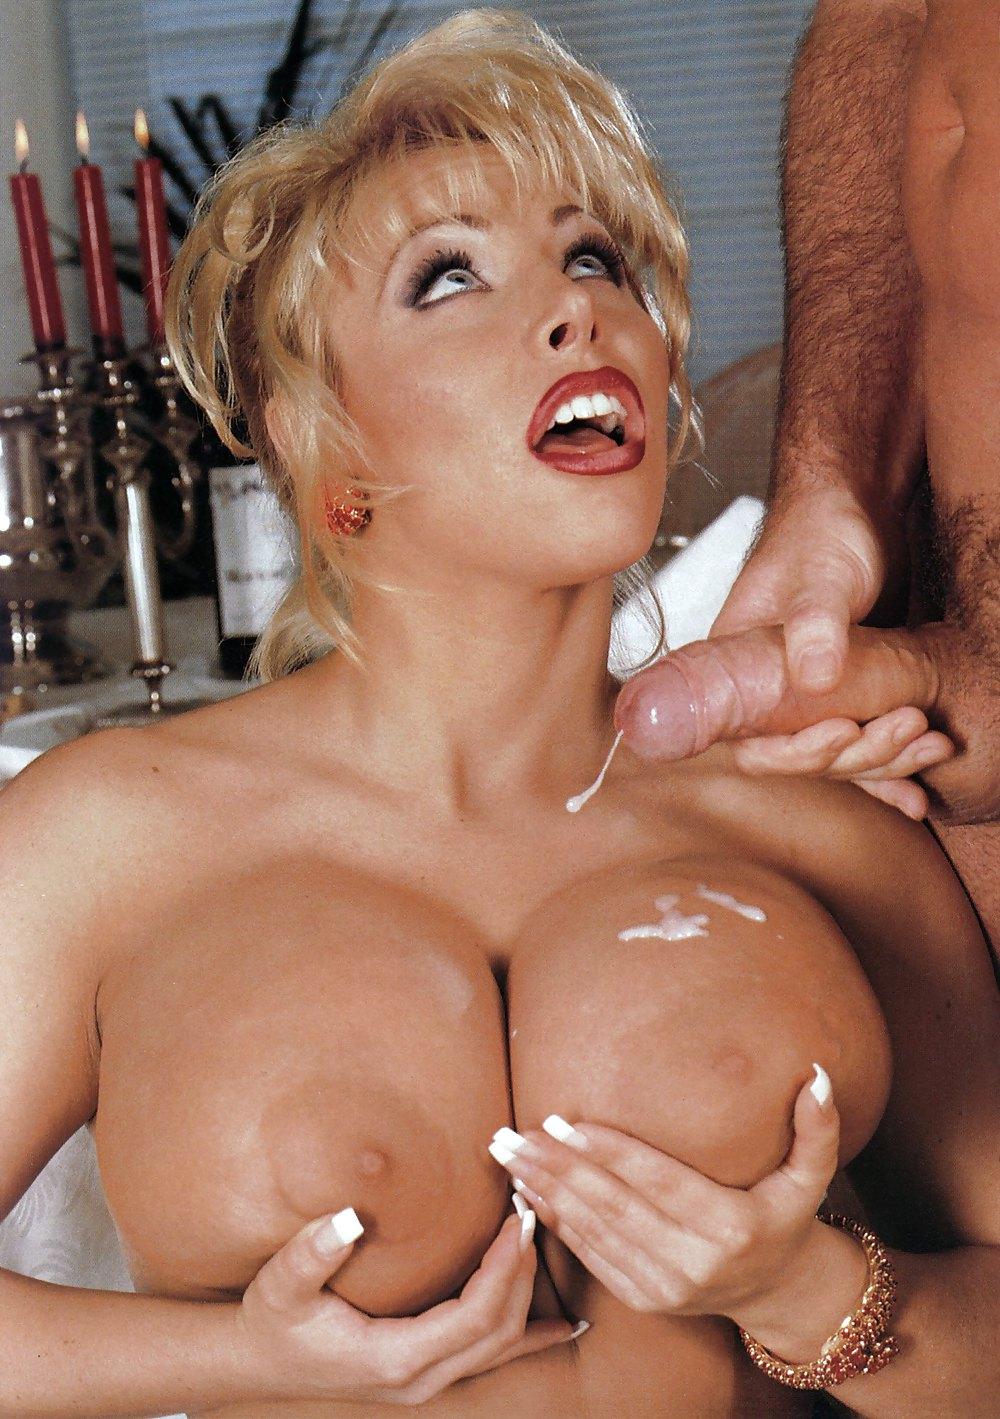 Big boob bukkake lovette — pic 15